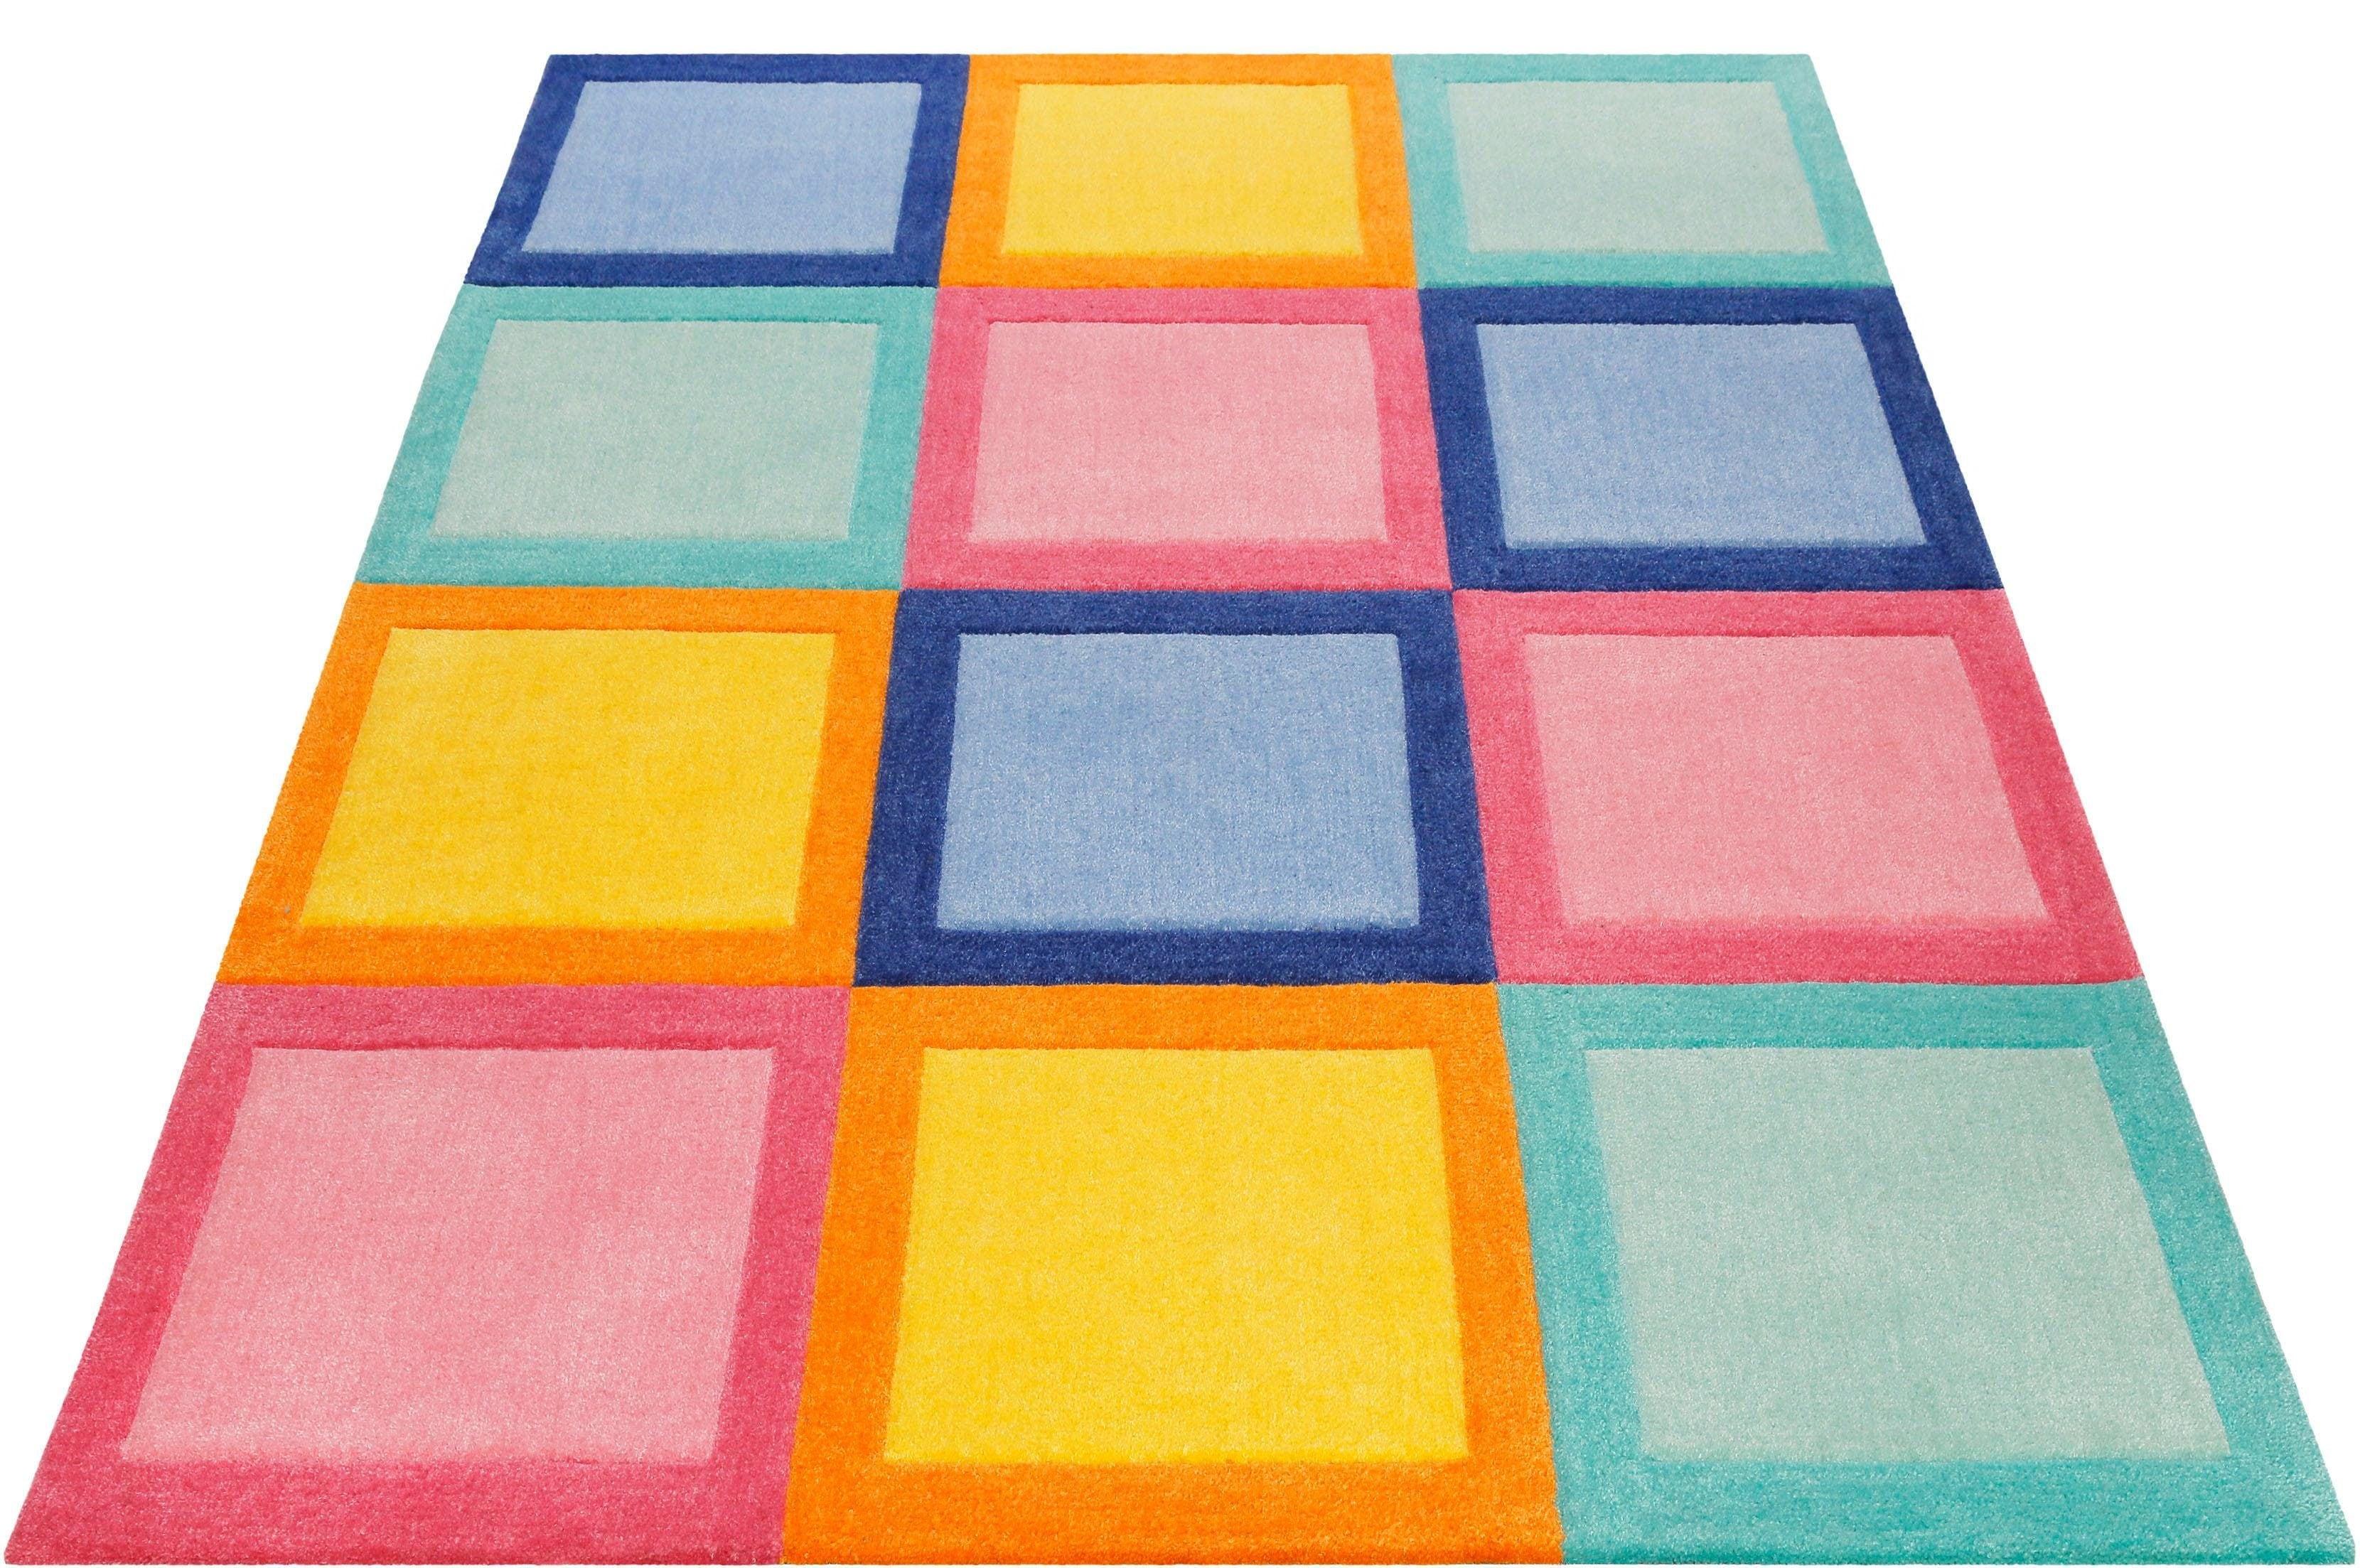 Image of Kinderteppich, »Domino Day«, SMART KIDS, rechteckig, Höhe 9 mm, handgetuftet